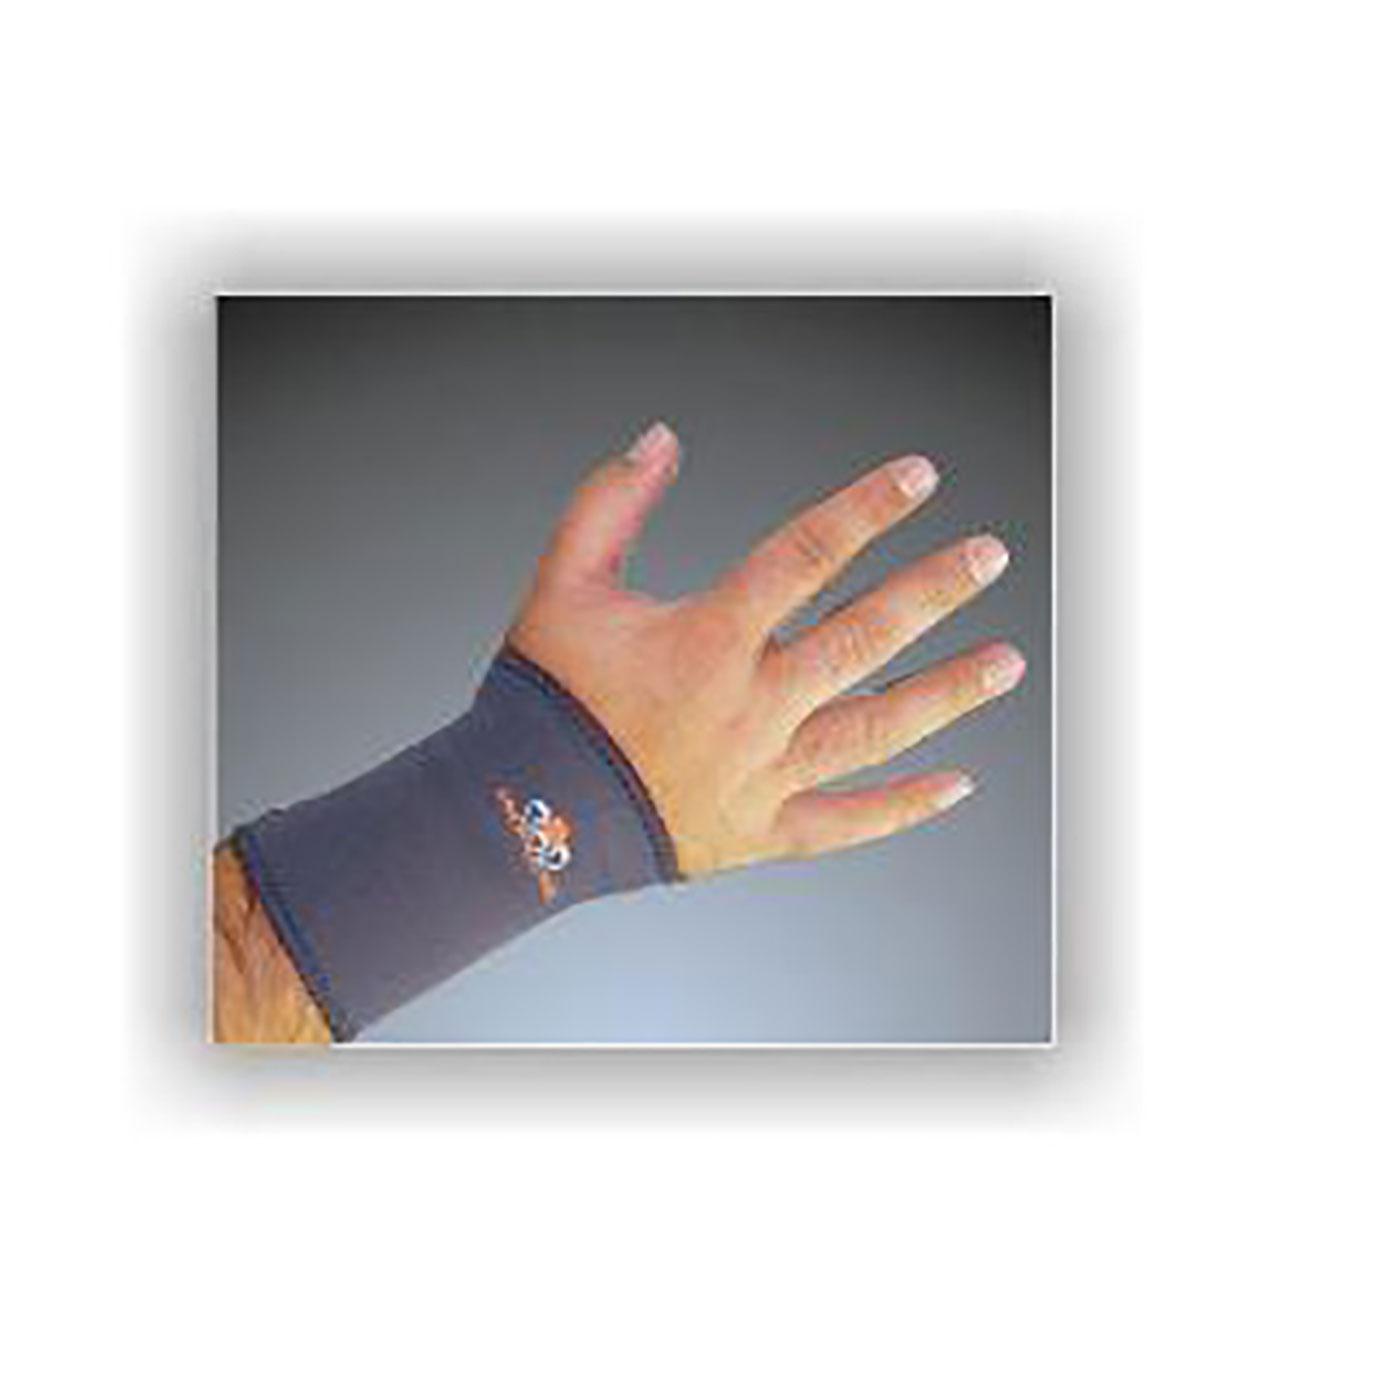 Impacto Wrist/Forearm Support (Wrist)